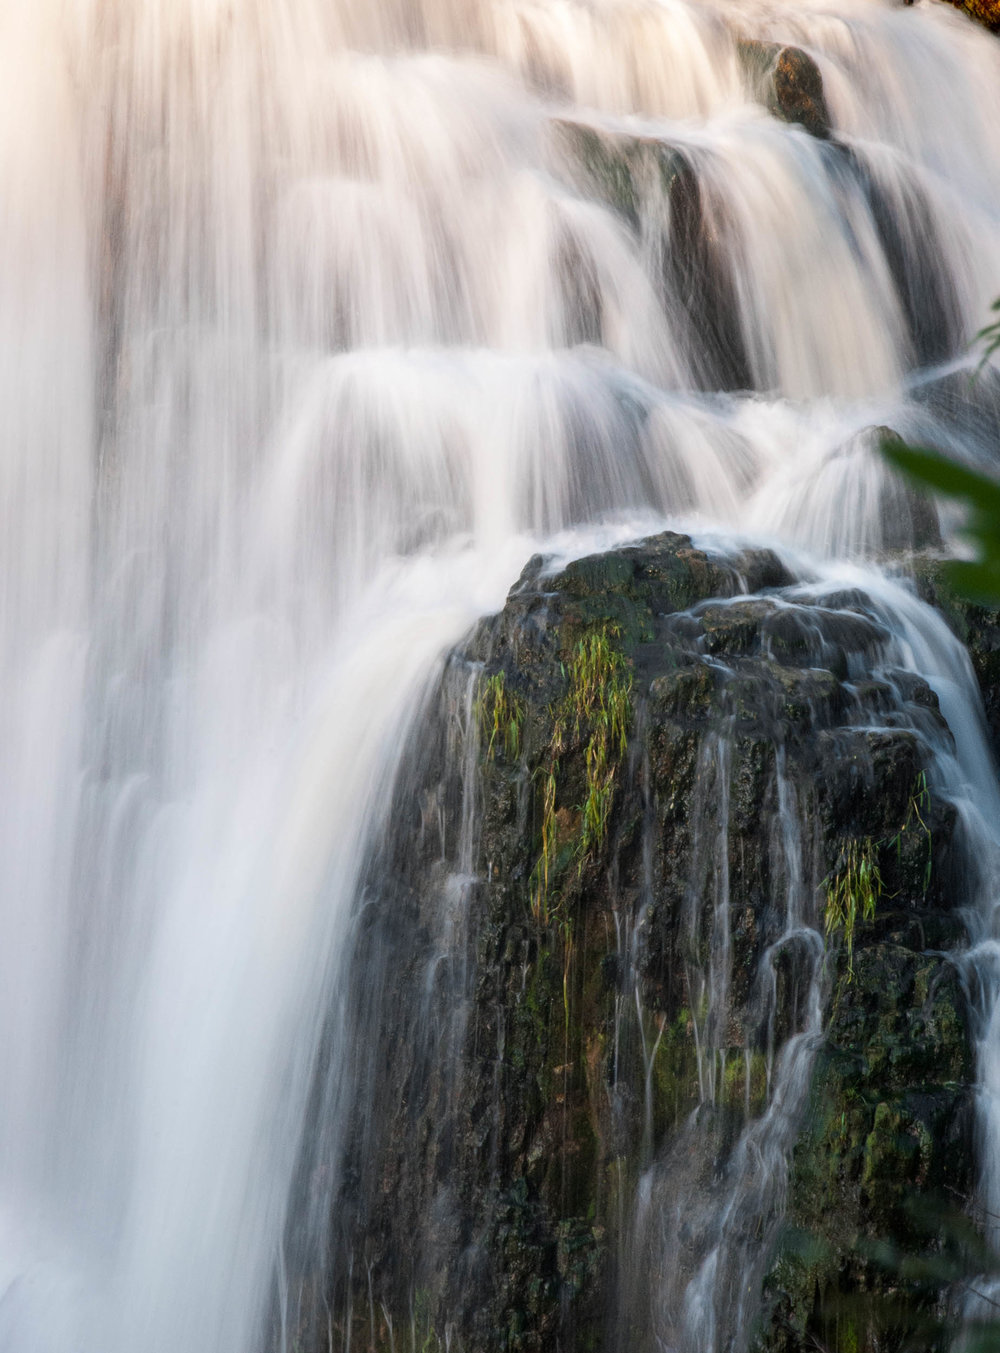 The Sydenham River flowing down the Niagara Escarpment at Inglis Falls, Ontario.